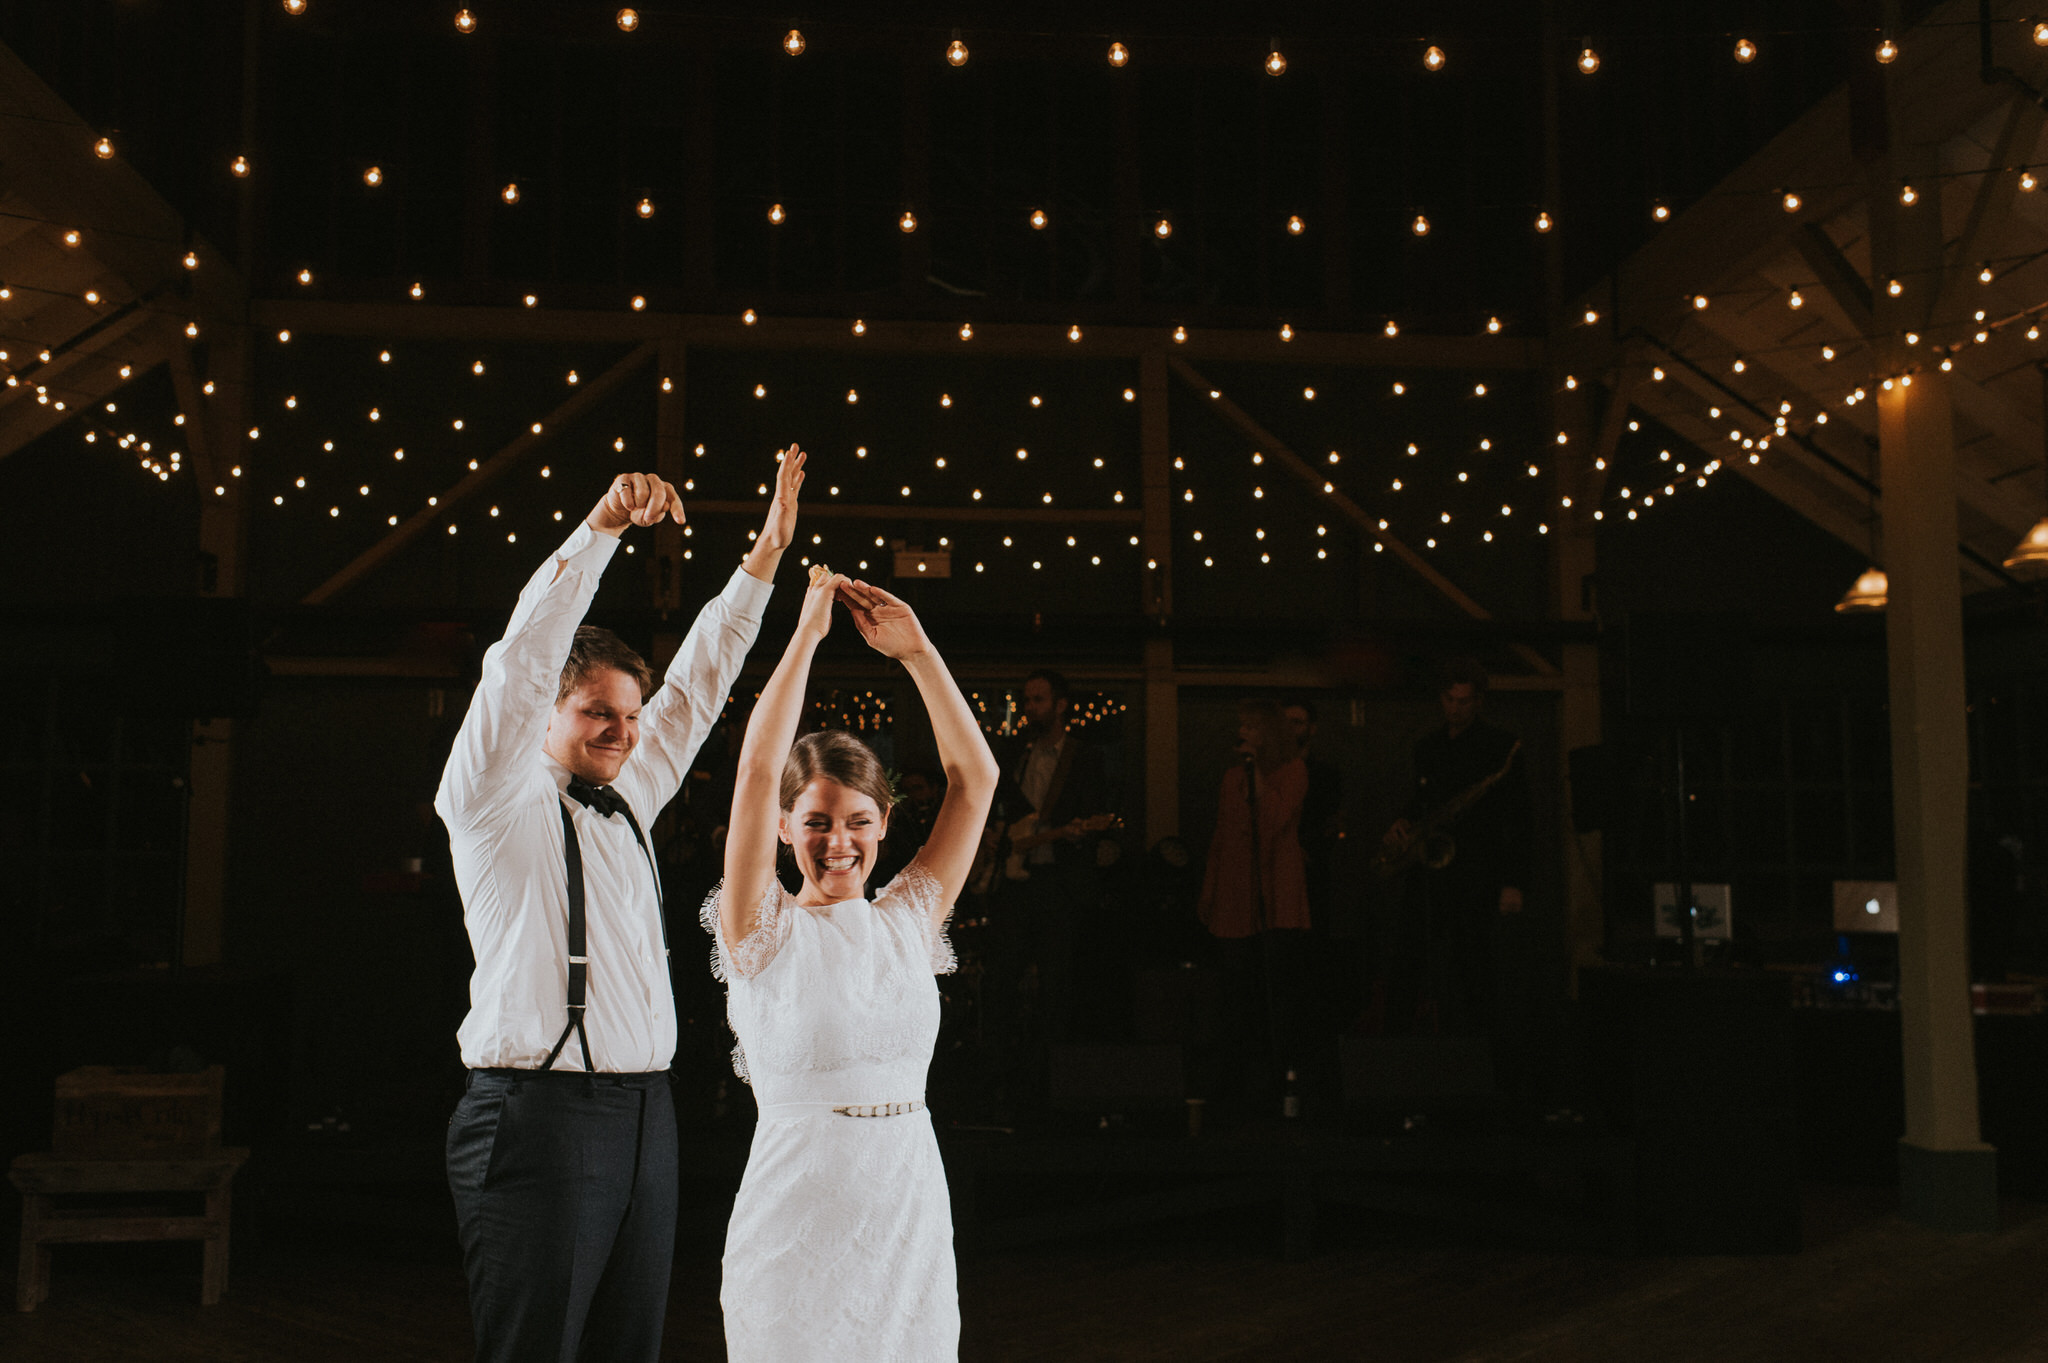 scarletoneillphotography_weddingphotography_prince edward county weddings174.JPG